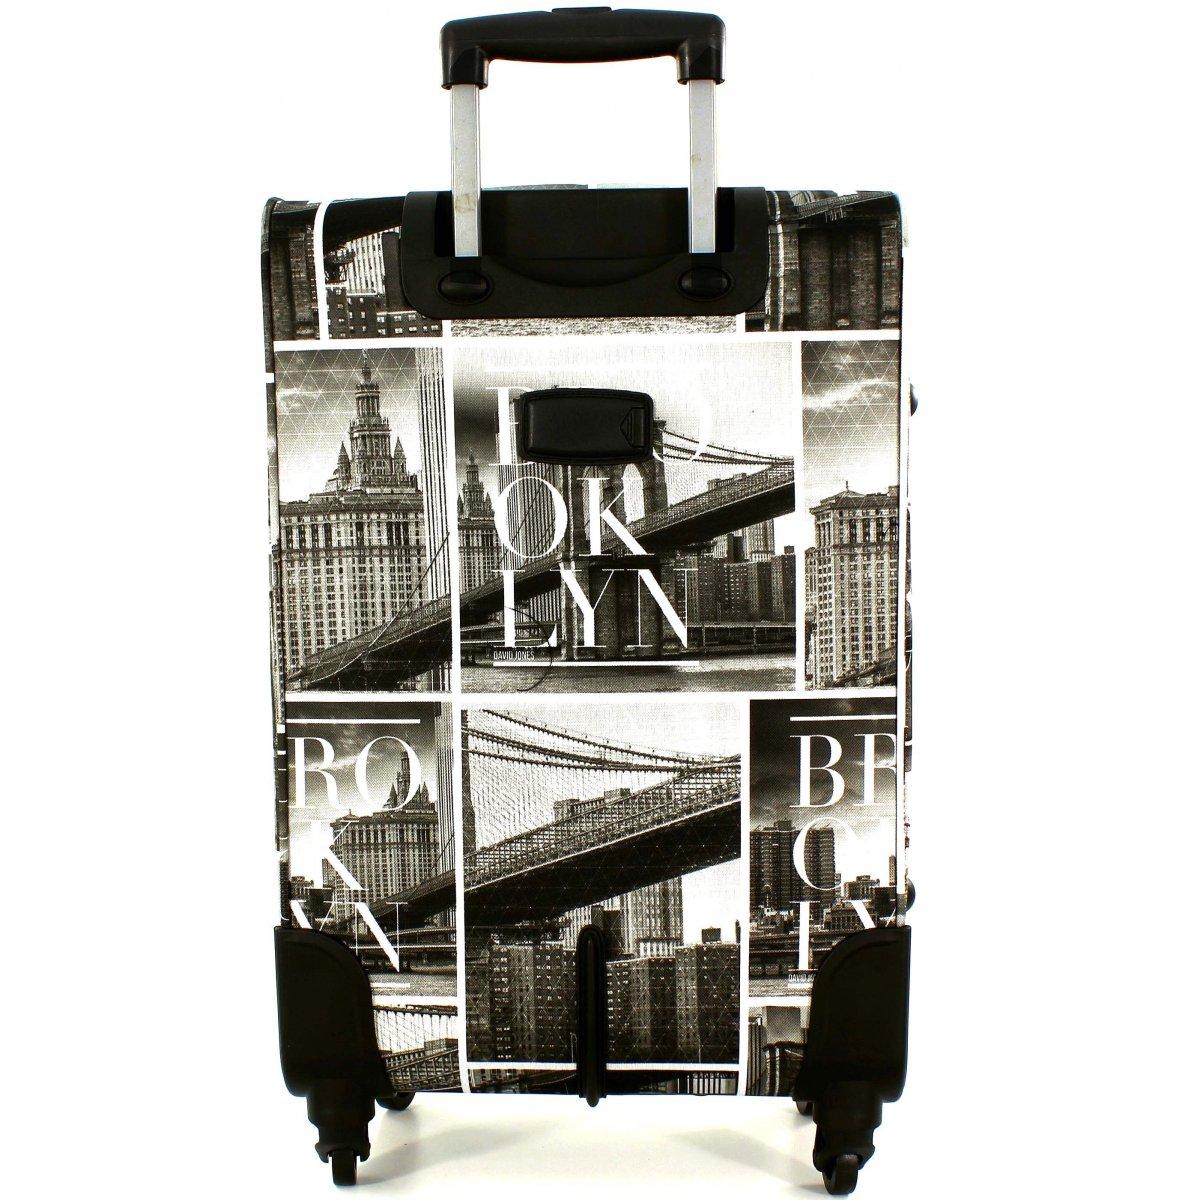 lot 3 valises dont 1 cabine ryanair david jones ba50273 couleur principale brooklyn. Black Bedroom Furniture Sets. Home Design Ideas